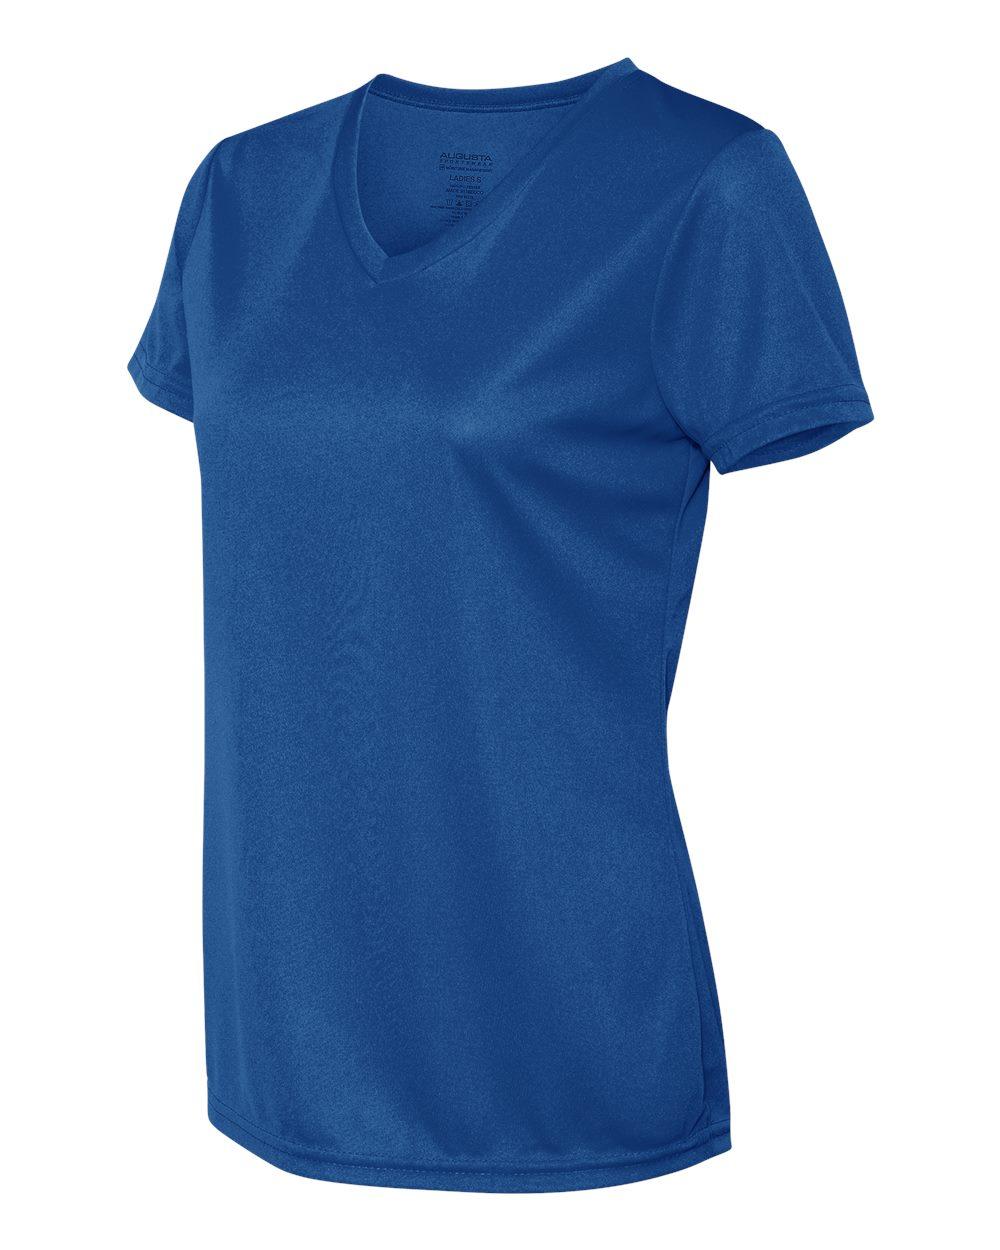 Augusta-Sportswear-Women-039-s-Moisture-Wicking-V-Neck-T-Shirt-1790-XS-2XL thumbnail 30